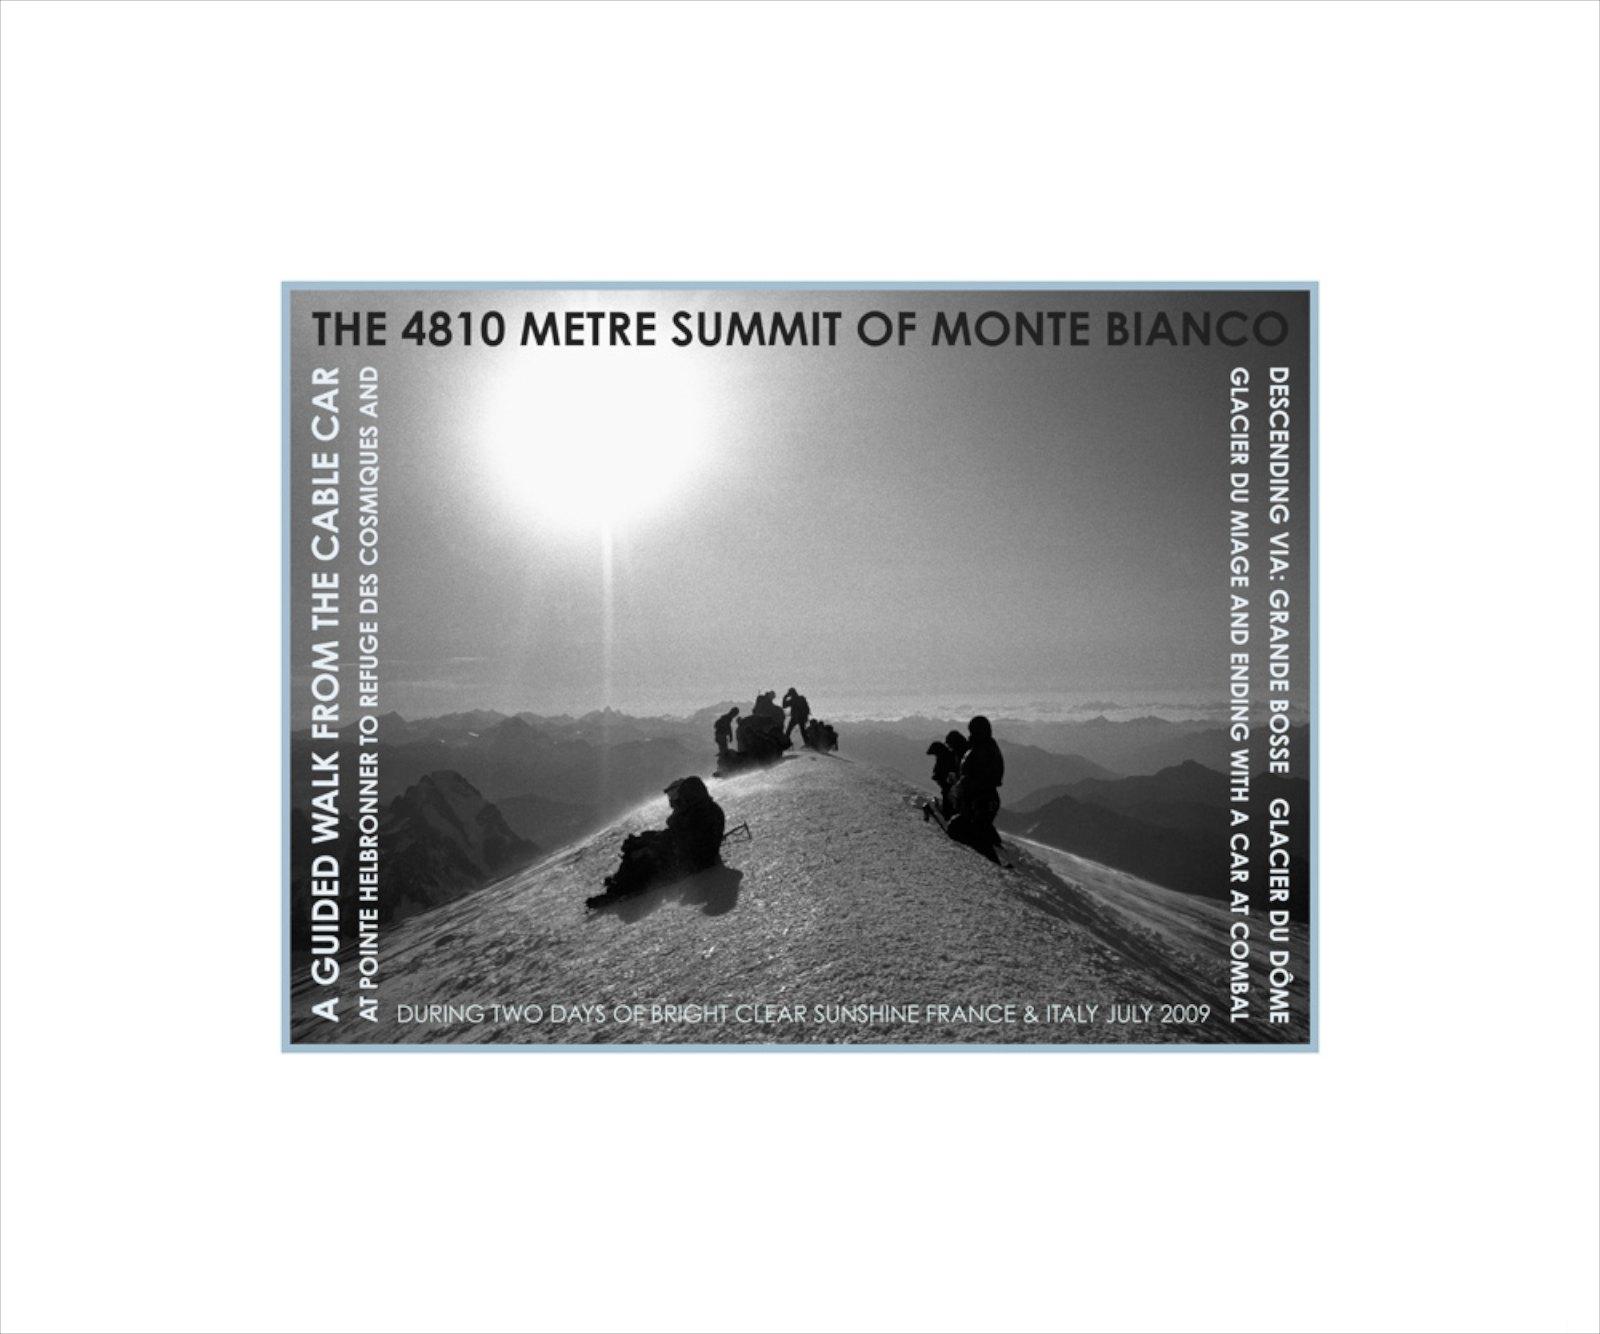 Summit of Monte Bianco, France & Italy 2009, Giclée print, 43 x 51,5 cm